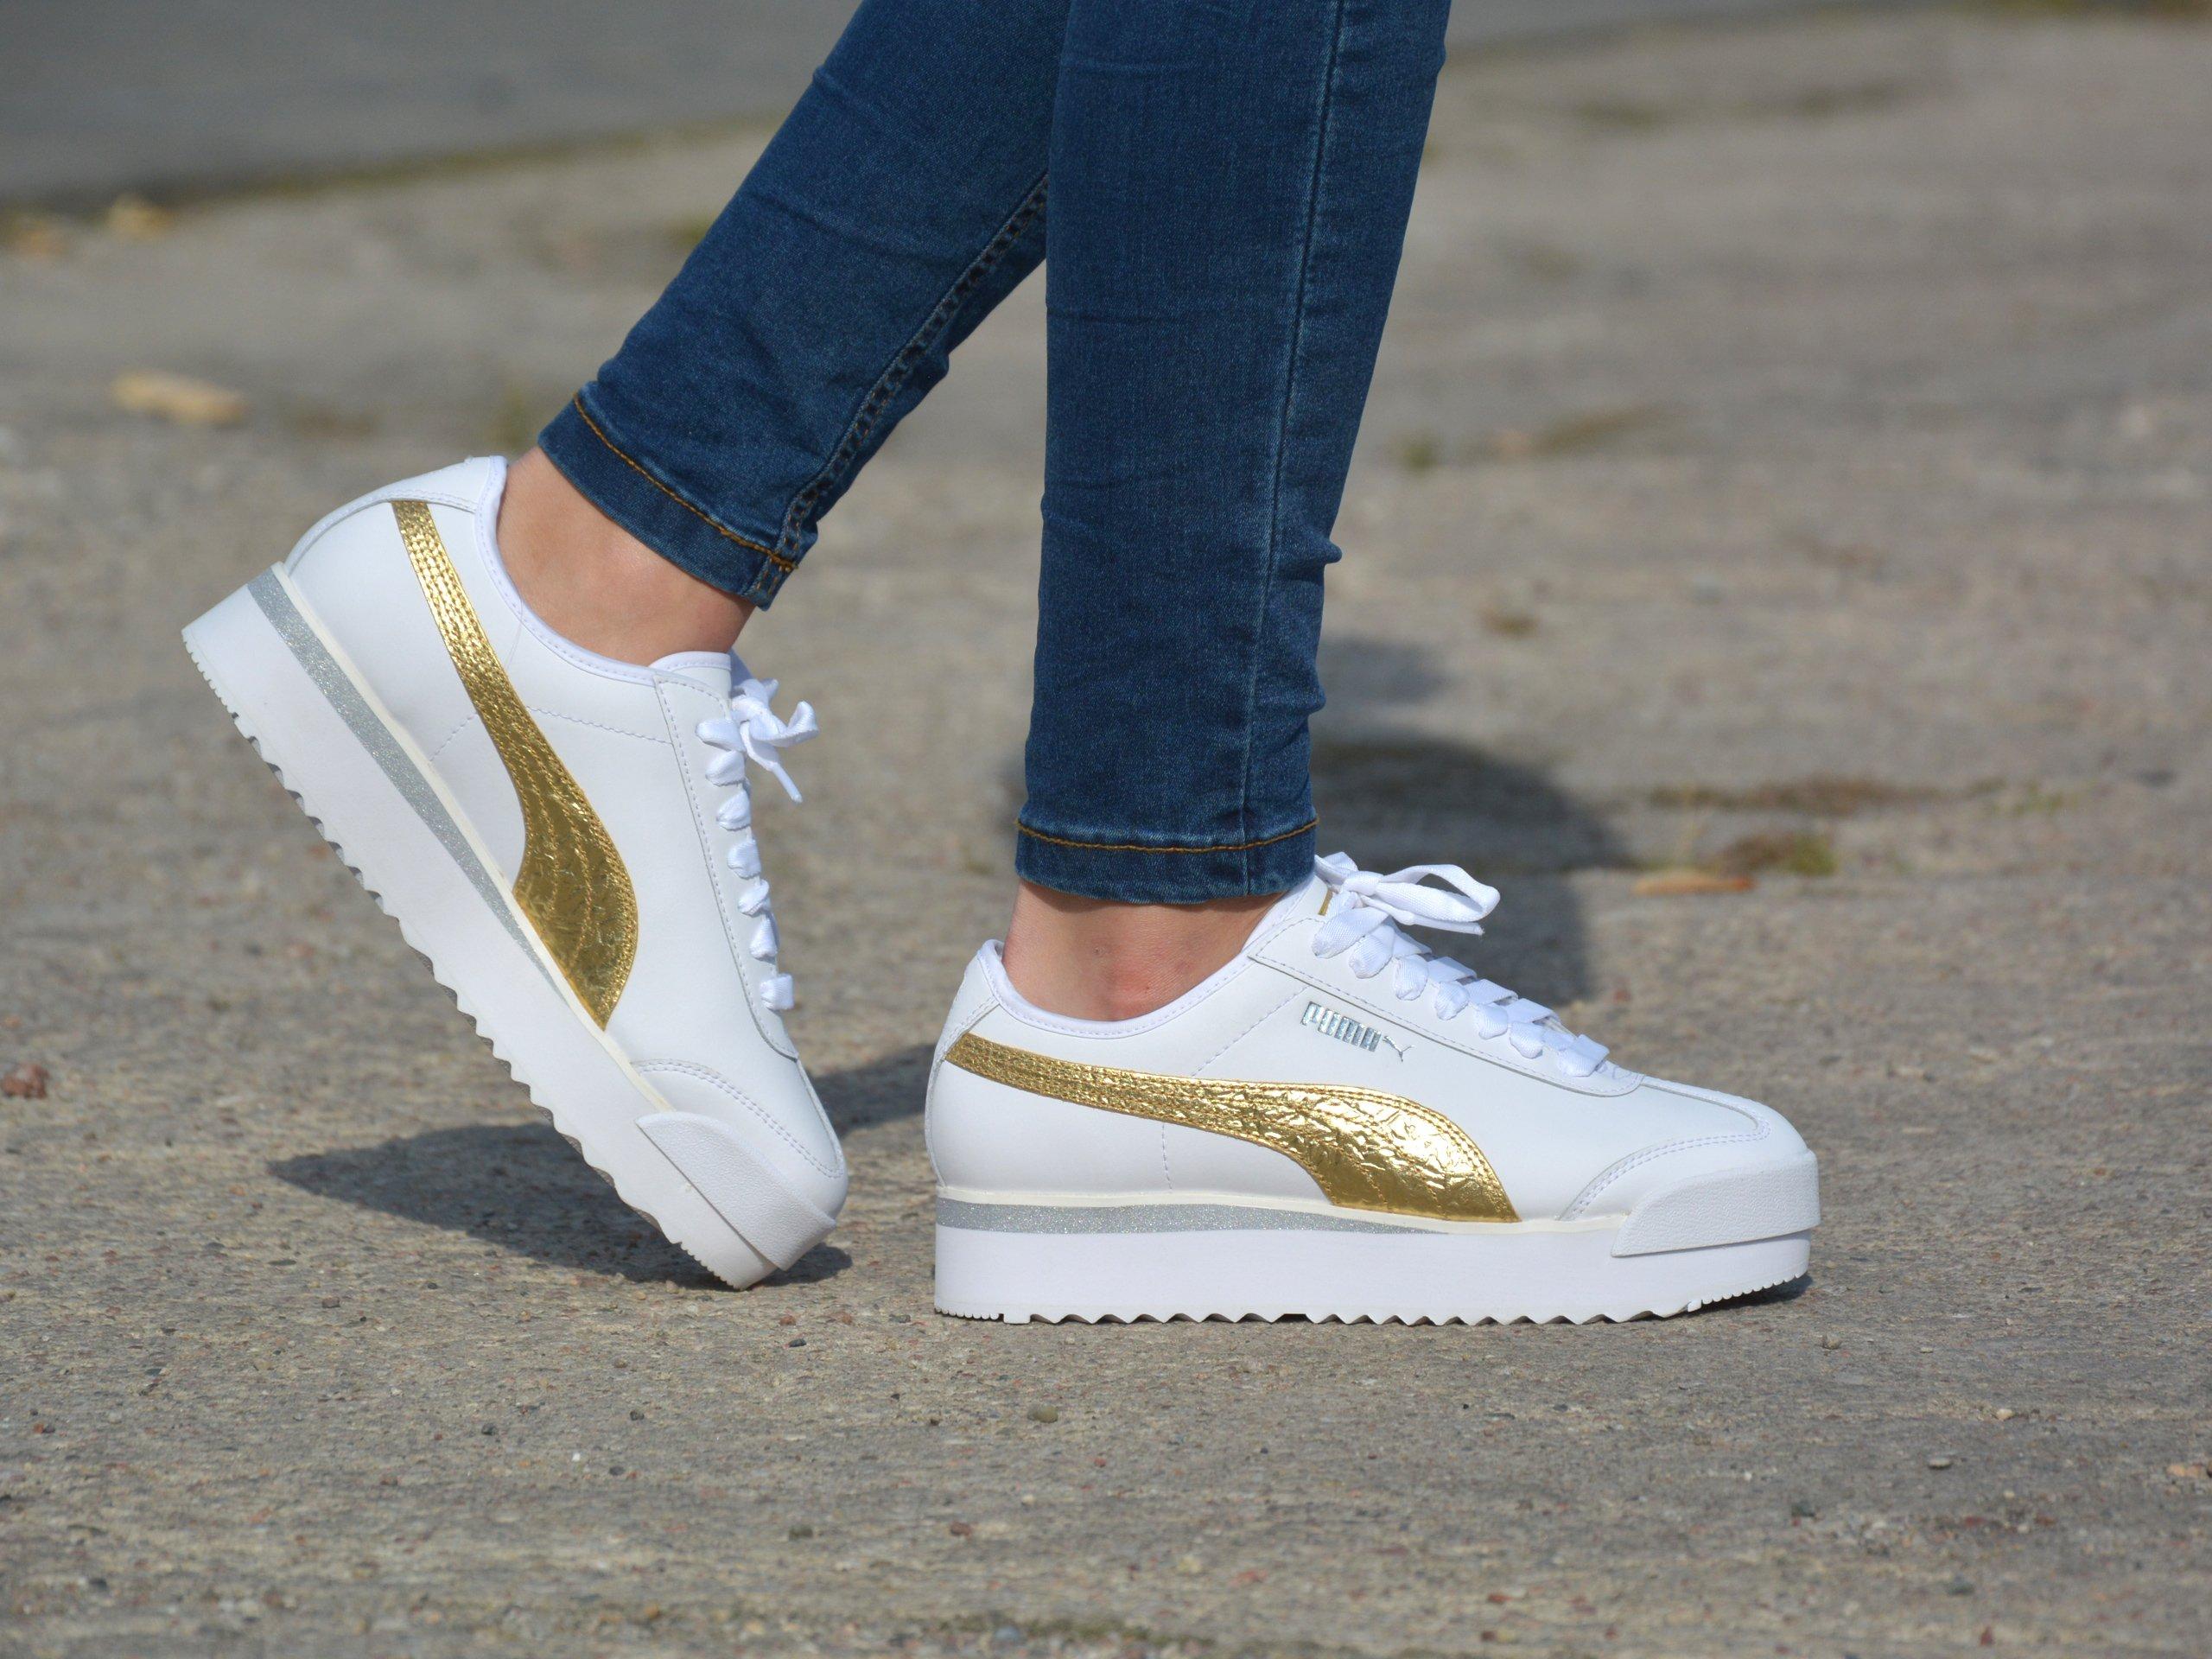 Puma - Roma Amor 371702-01 - Sneakers - White / Gold   Womens ...